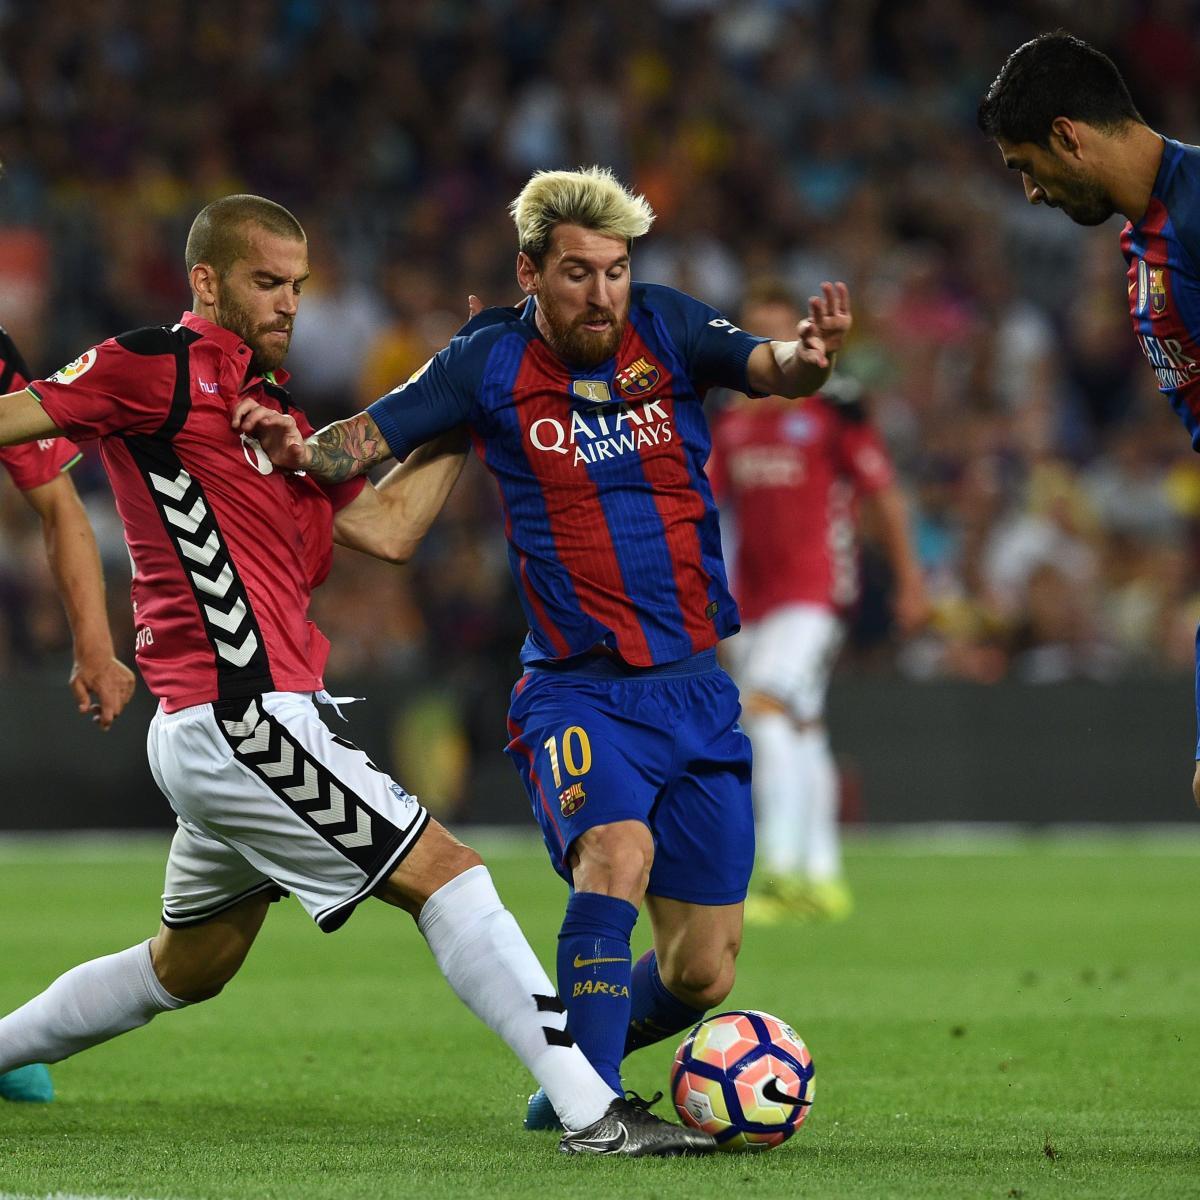 Celta Vigo Vs Barcelona Predictions Today: Alaves Vs. Barcelona: Team News, Preview, Live Stream And